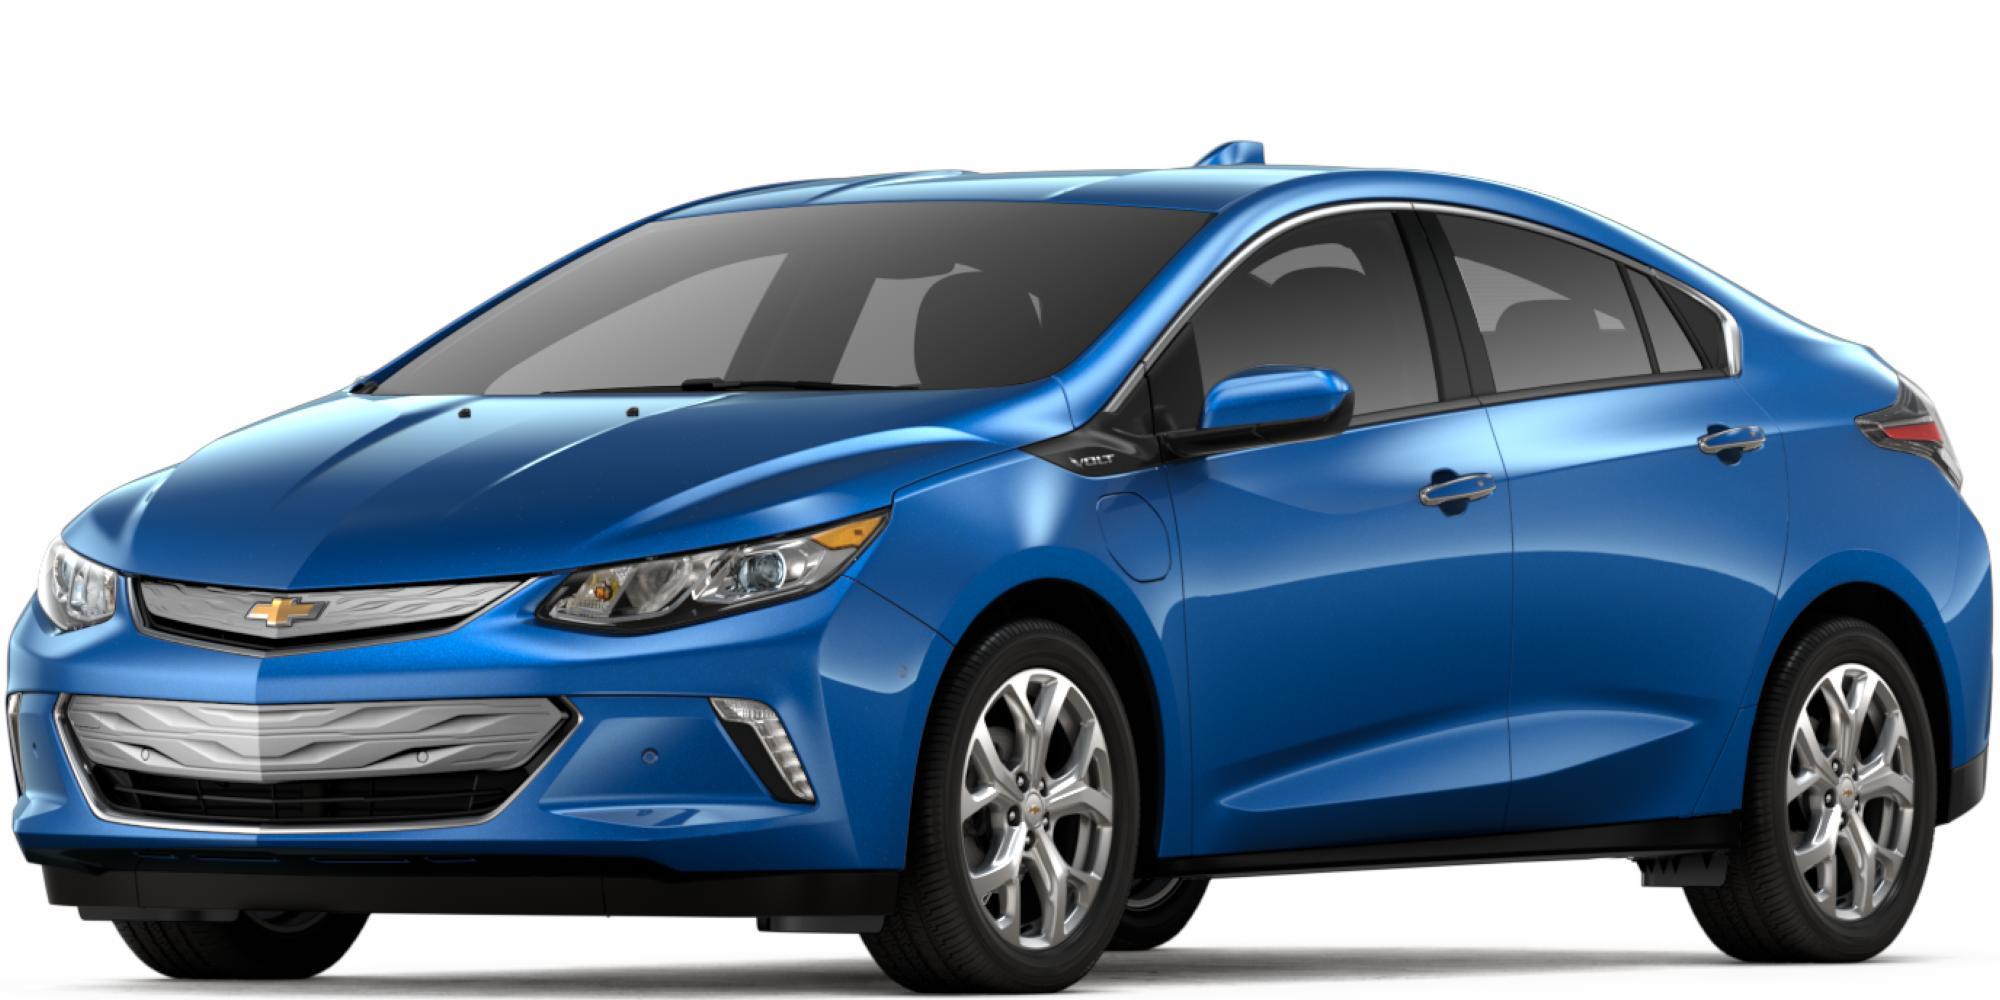 2018 Chevrolet Volt for sale near Sacramento | John L ...